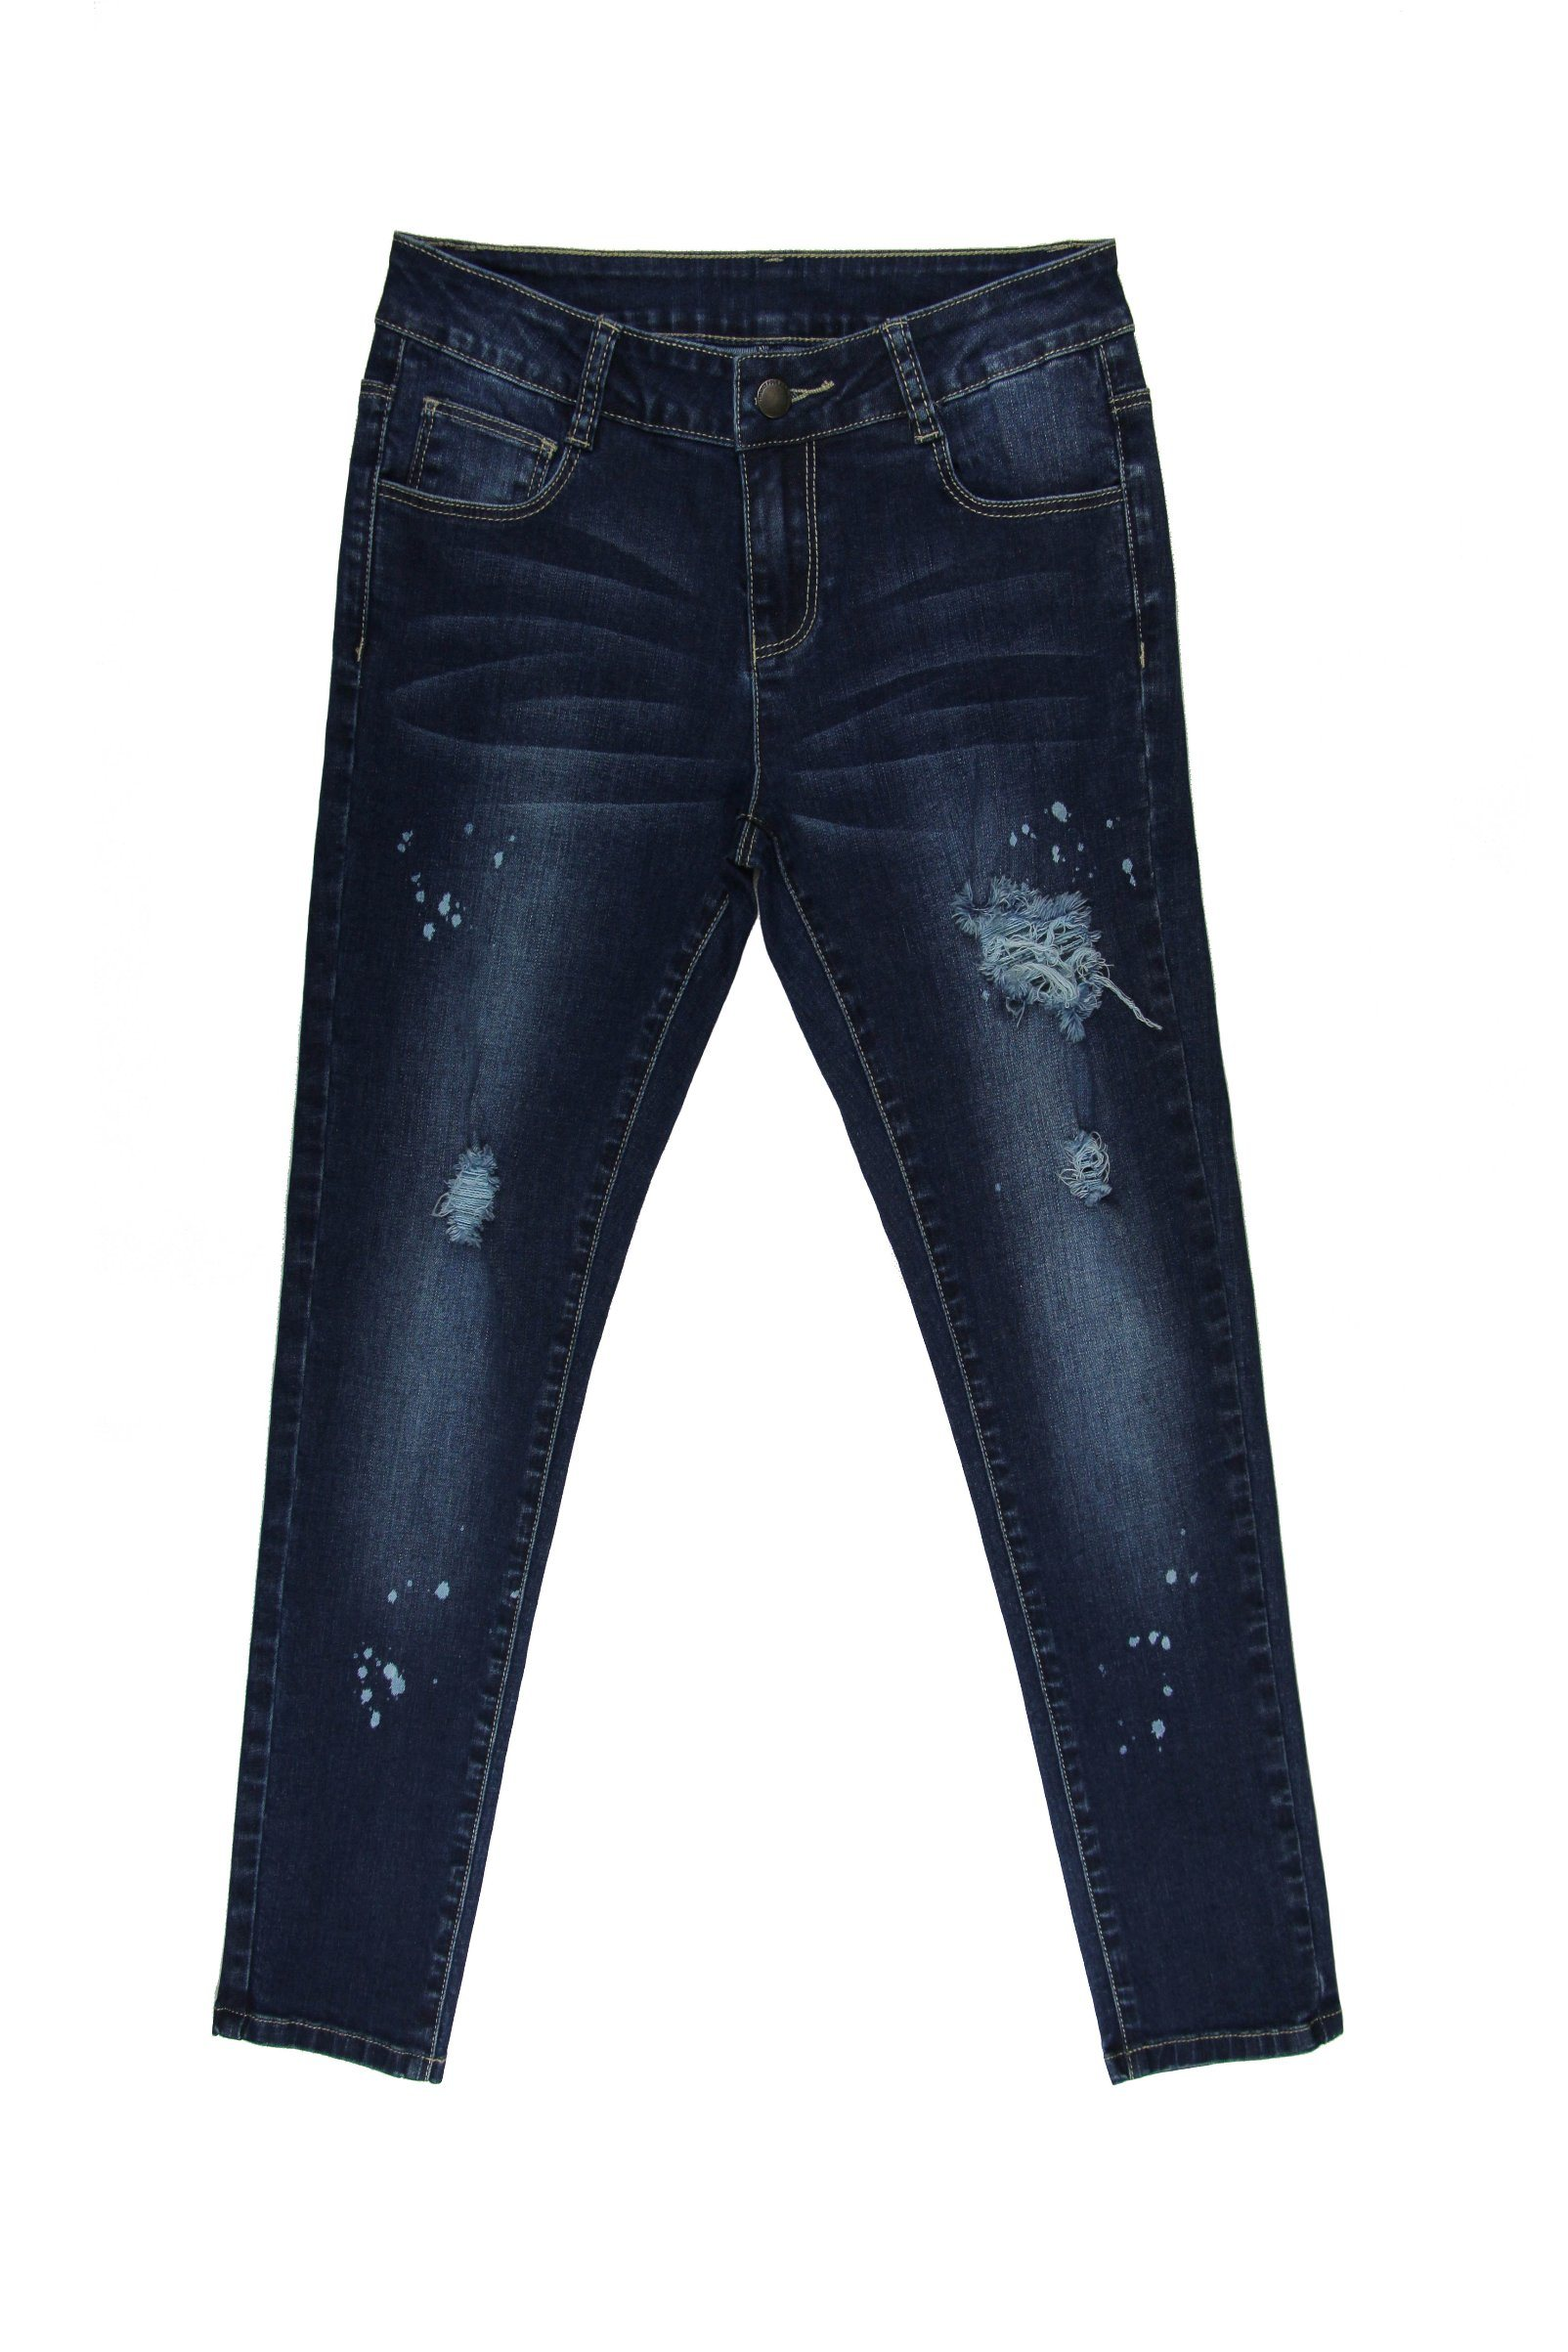 2017 Lady′s Print Washing Skinny Fashion Jeans (MYB07)